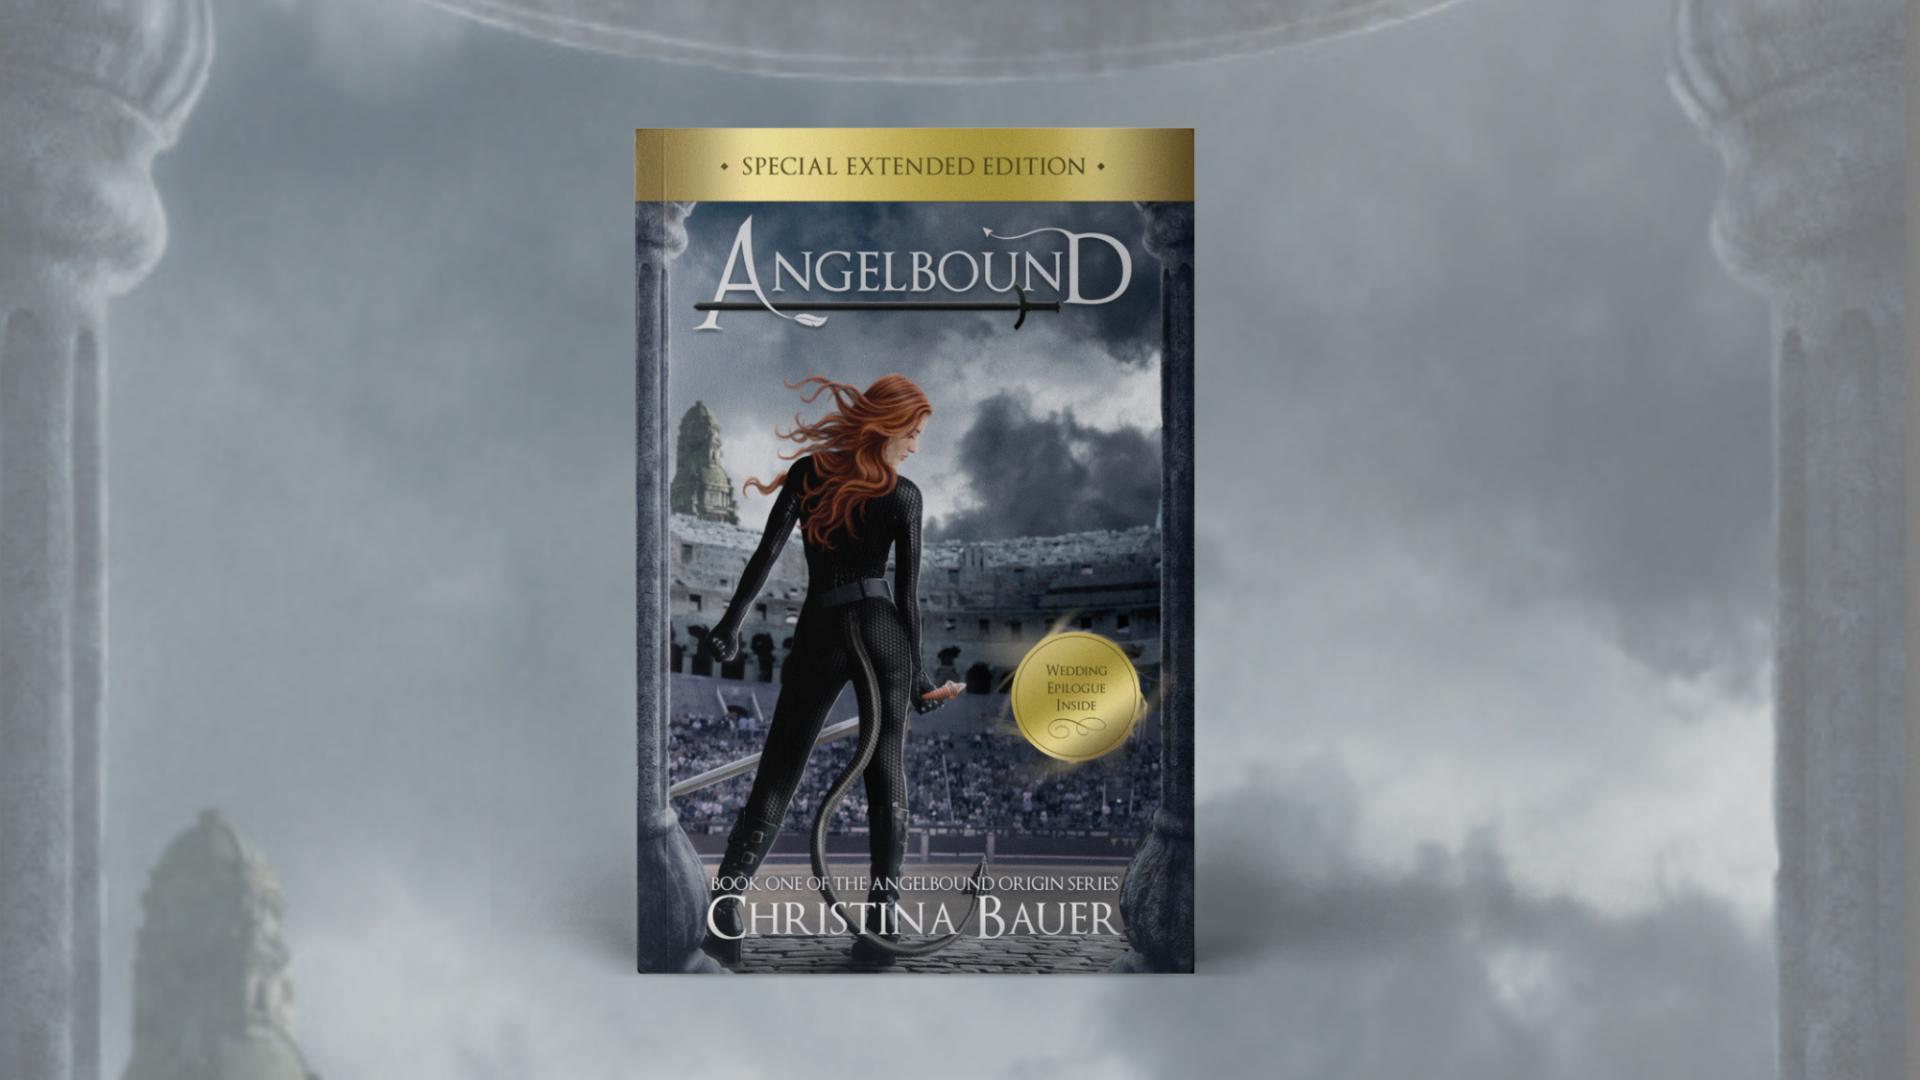 New Wedding Epilogue In ANGELBOUND Special Edition